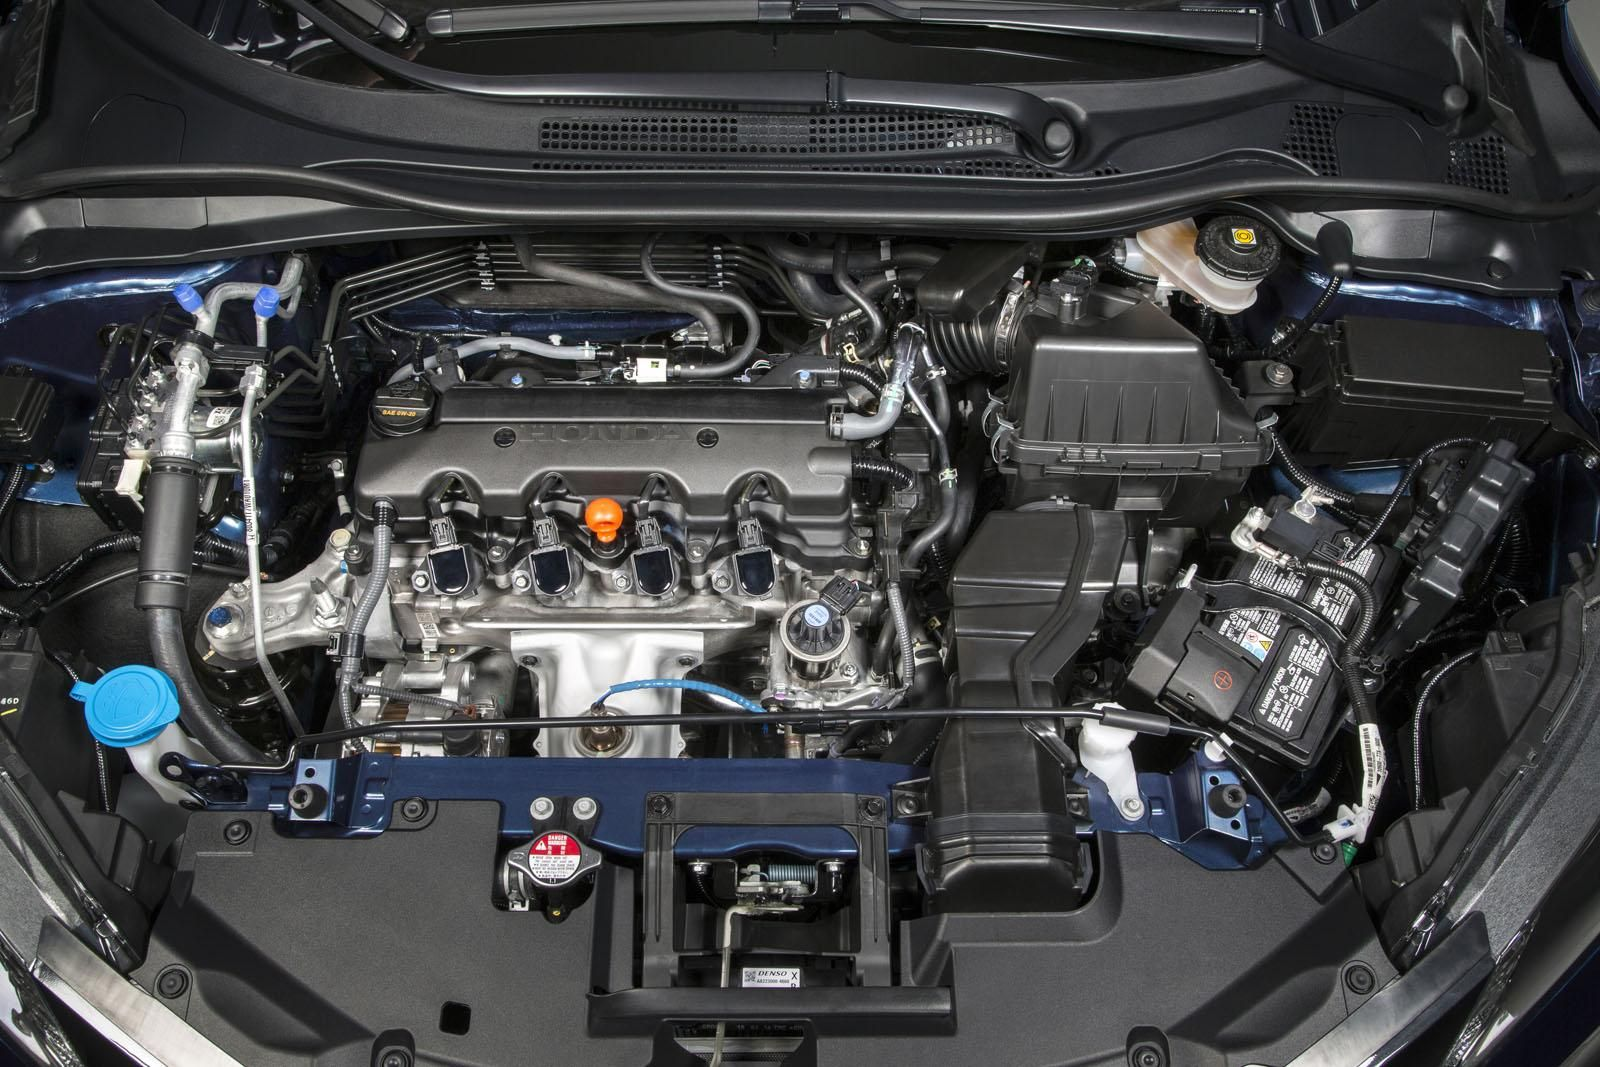 2016 Honda HRV under the hood Honda hrv, Honda crv